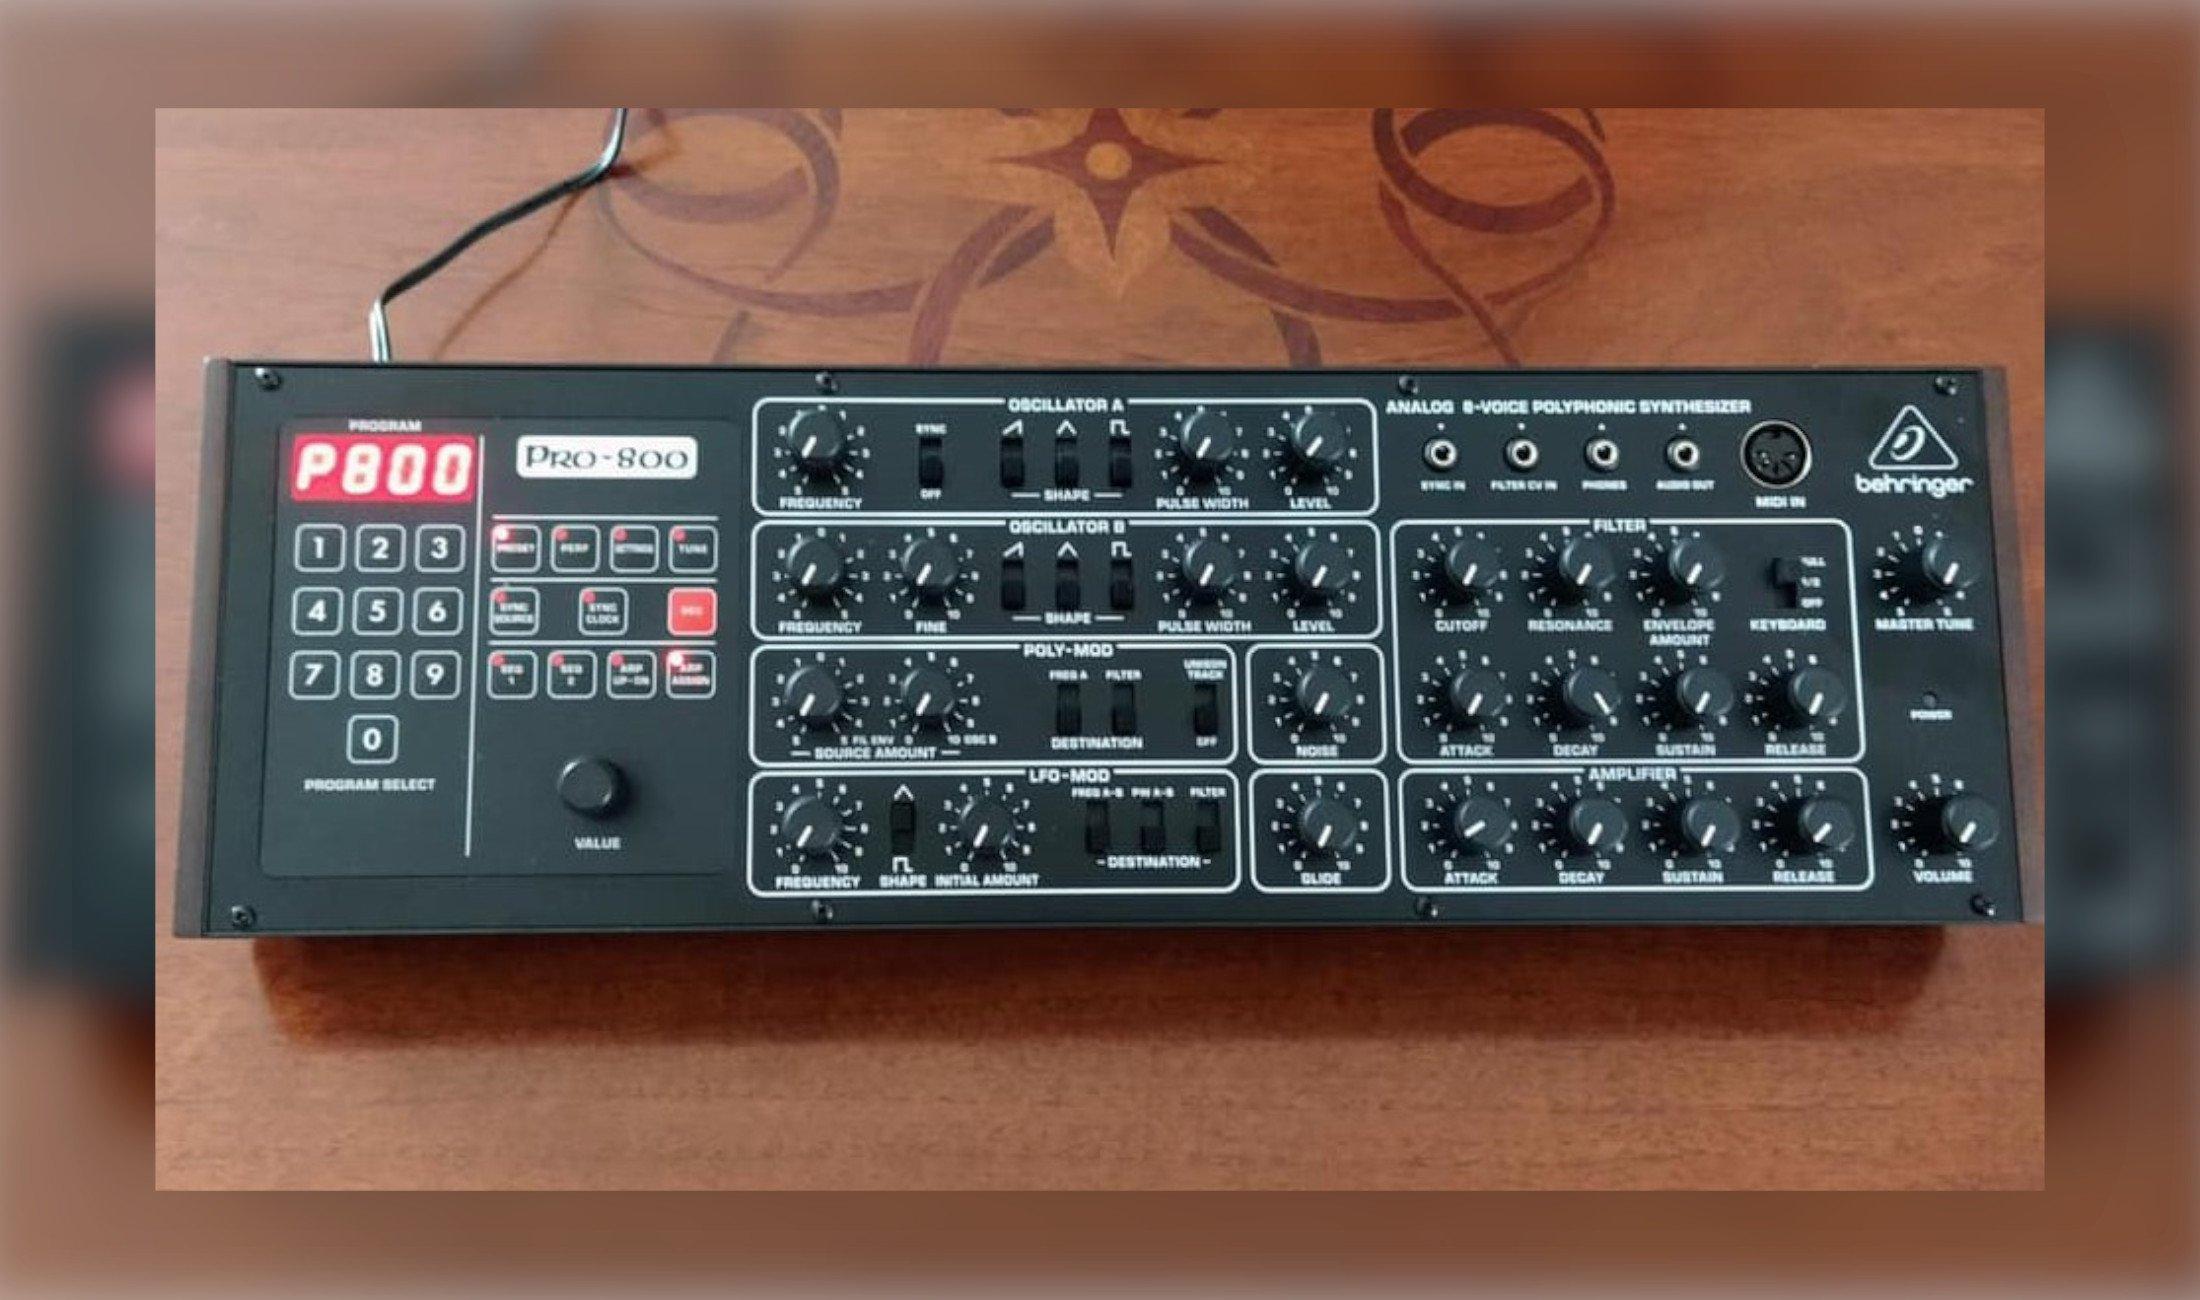 Behringer Pro-800: Klon des Prophet-600 vorgestellt - DJ LAB